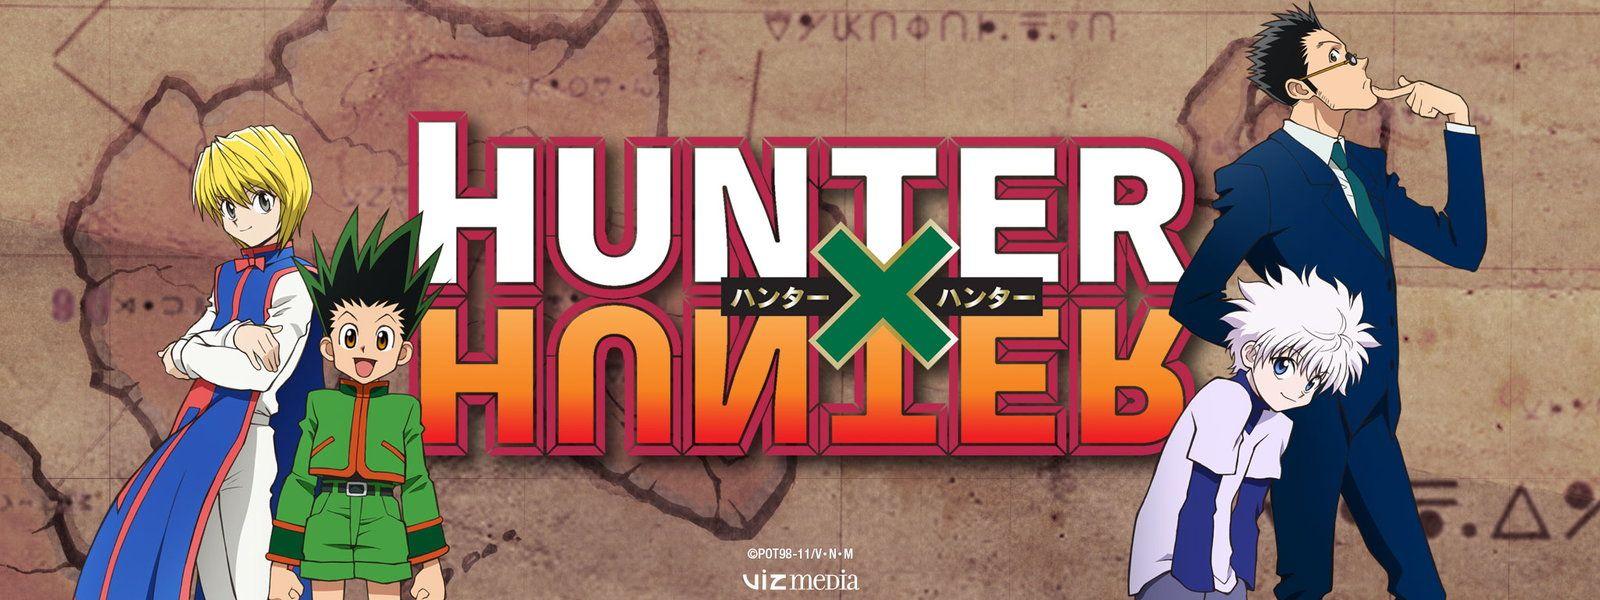 Watch Hunter x Hunter Online at Hulu Hunter x hunter